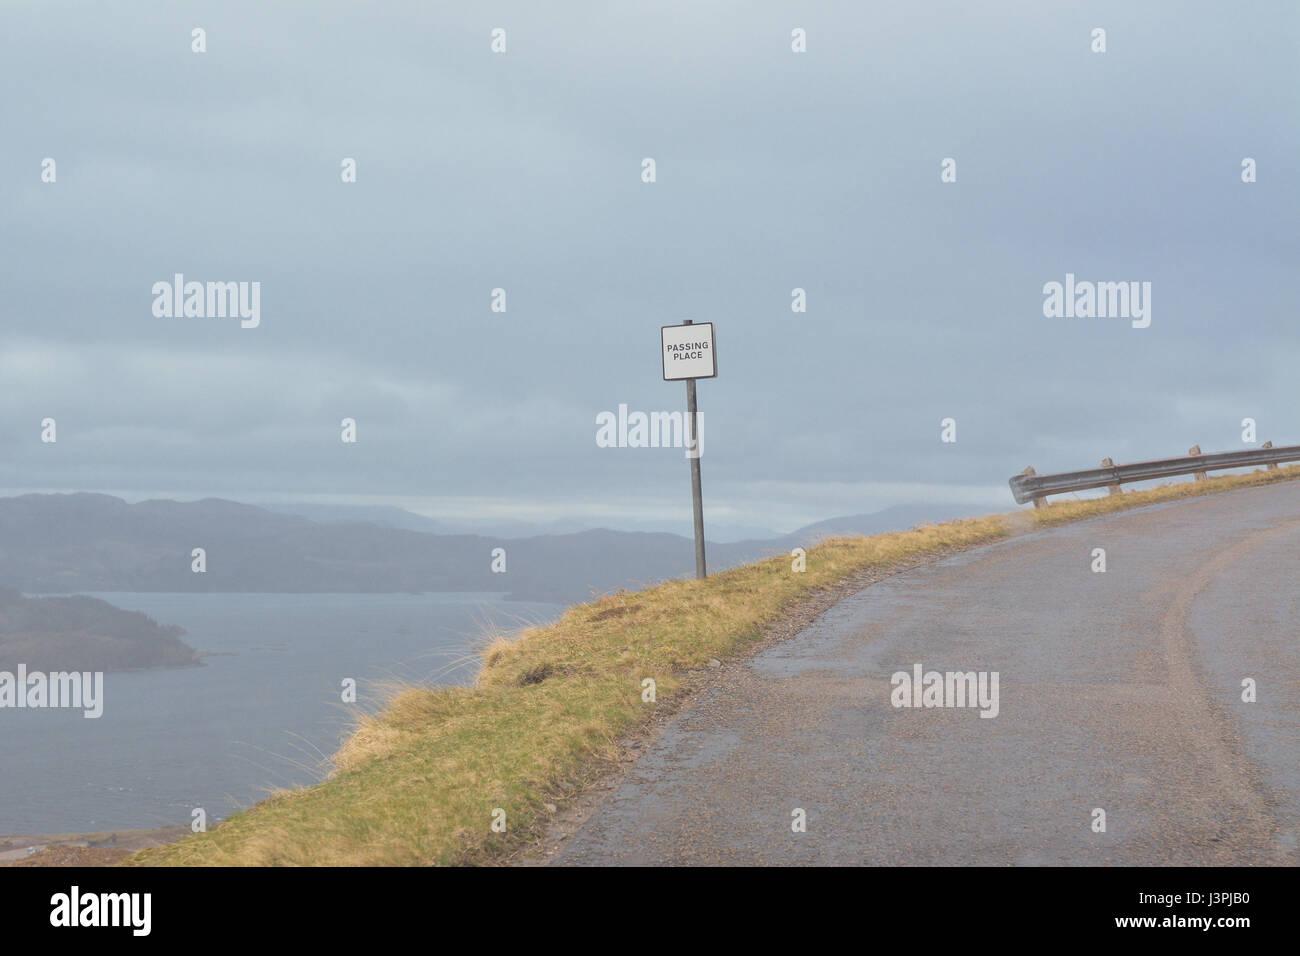 Bealach na Ba passing place - Stock Image